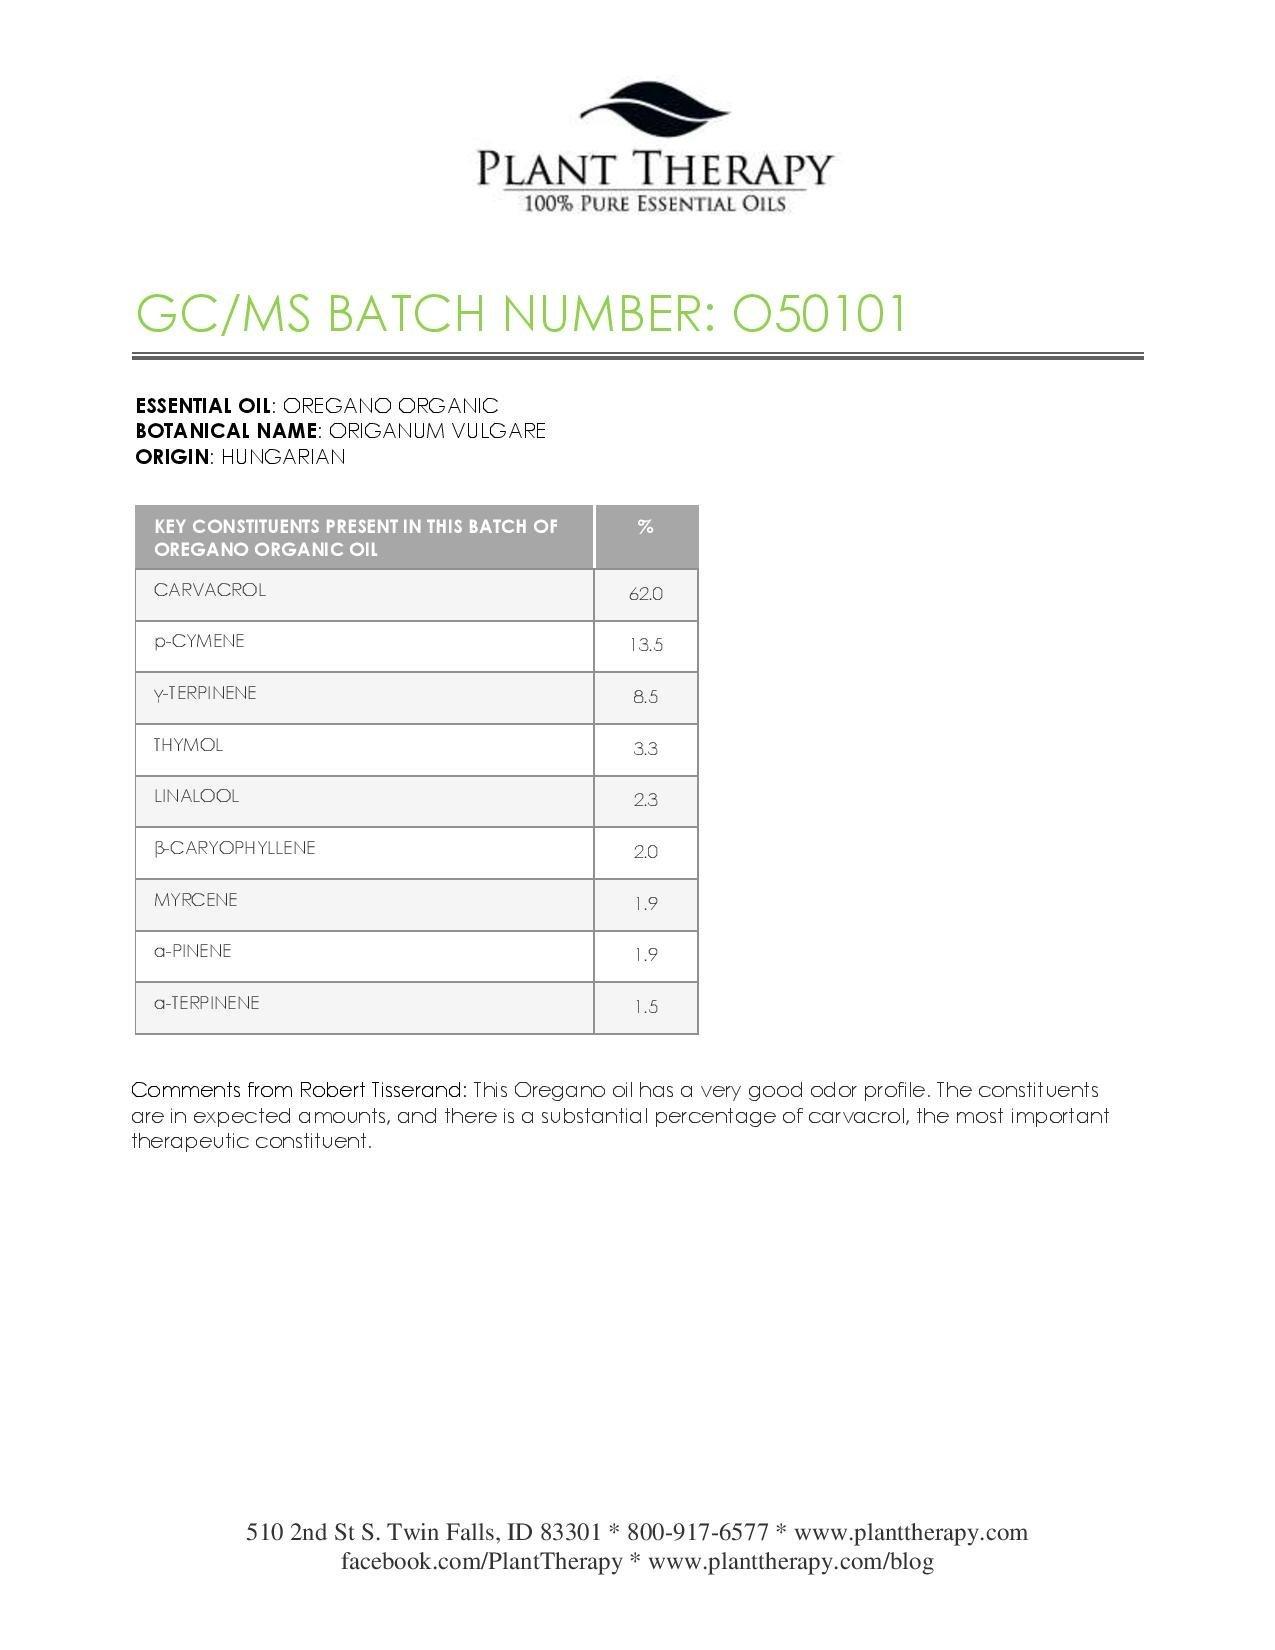 Plant Therapy USDA Certified Organic Oregano Essential Oil. 100% Pure, Undiluted, Therapeutic Grade. 10 ml (1/3 oz).